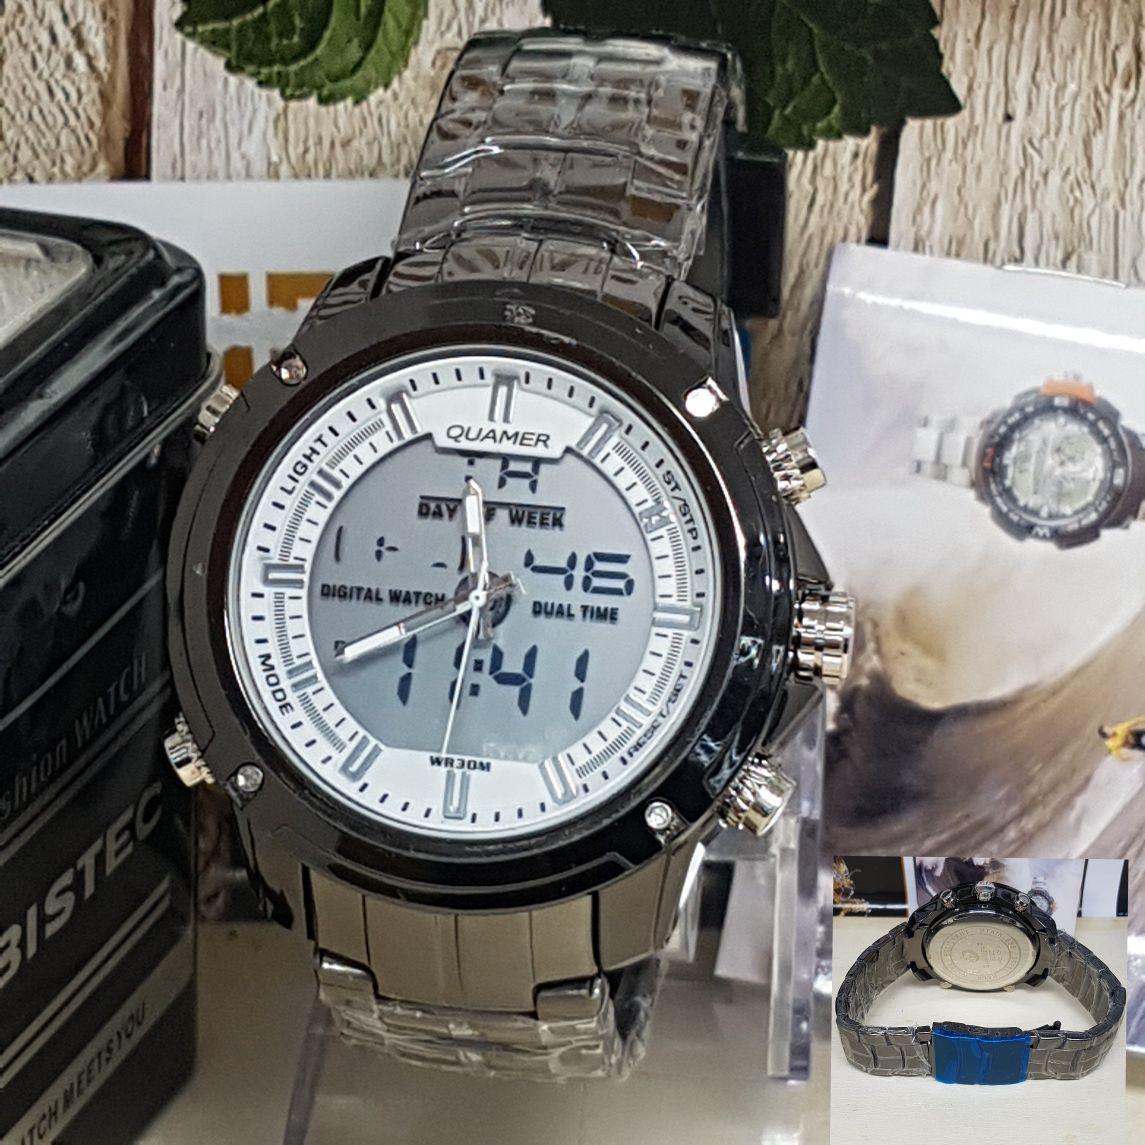 Jam Tangan quamer dual time import harga promo-pria